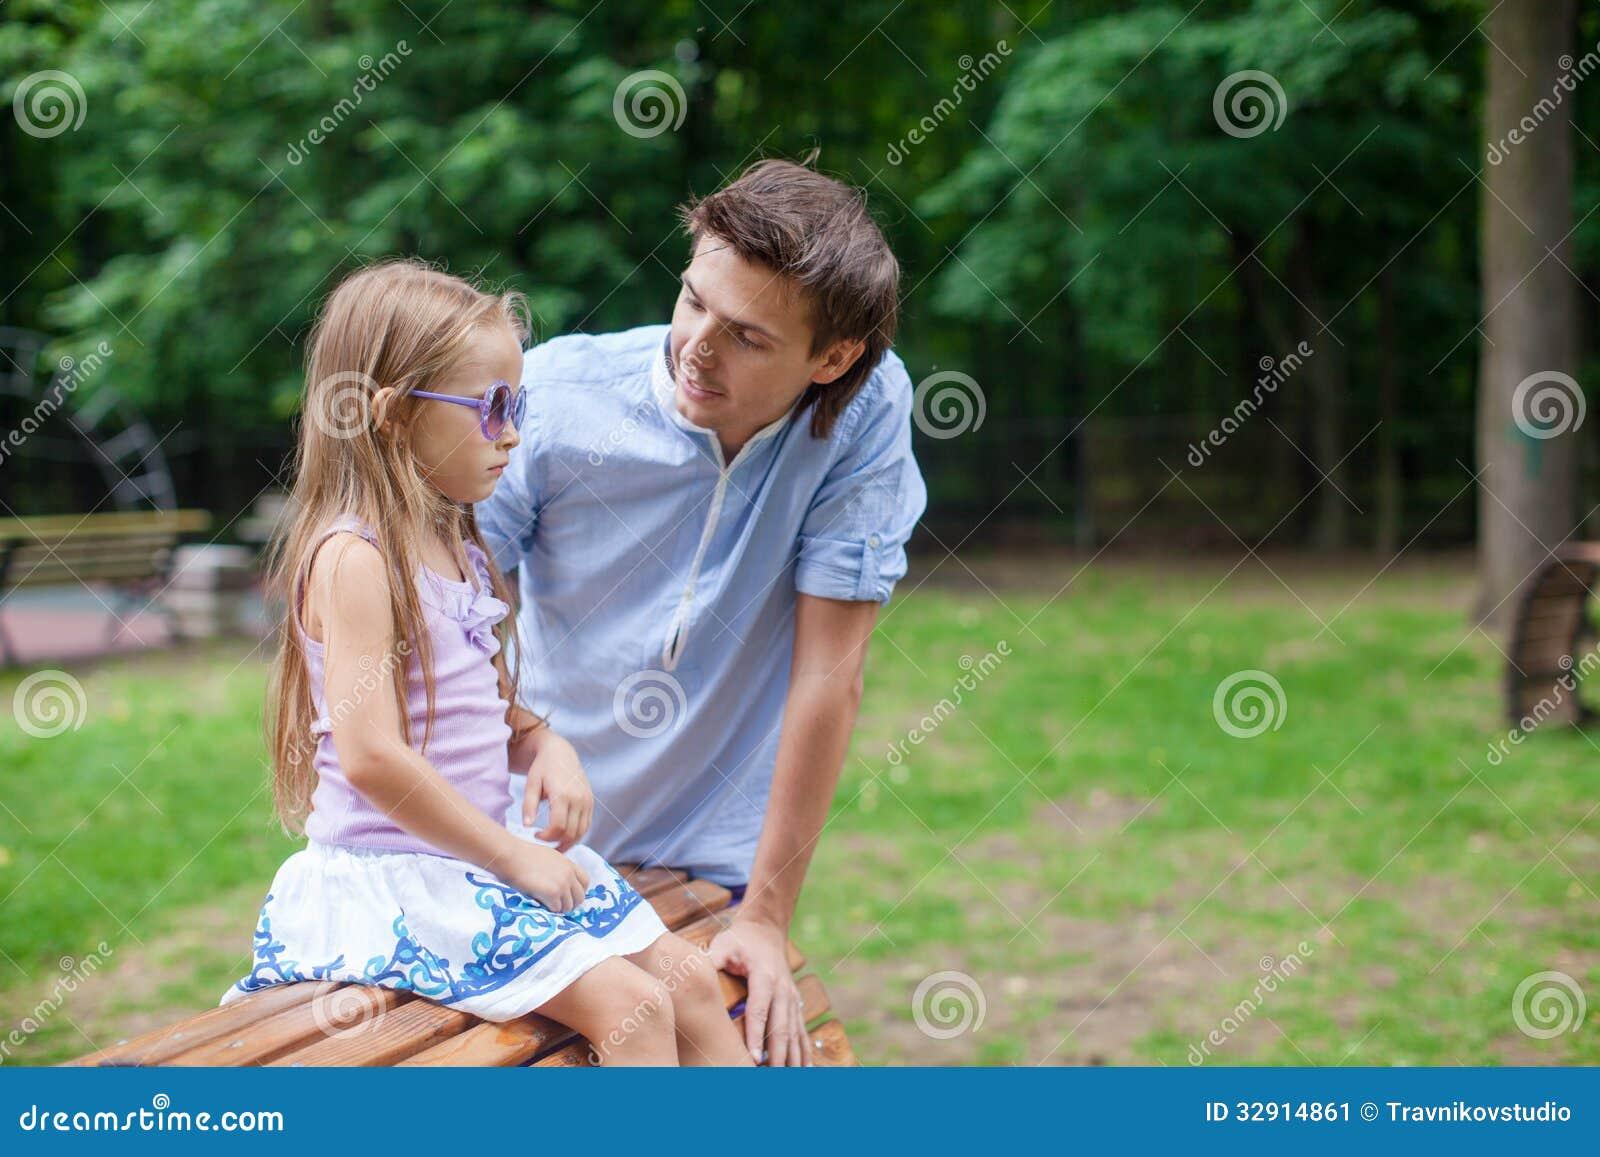 young dad fucks girl